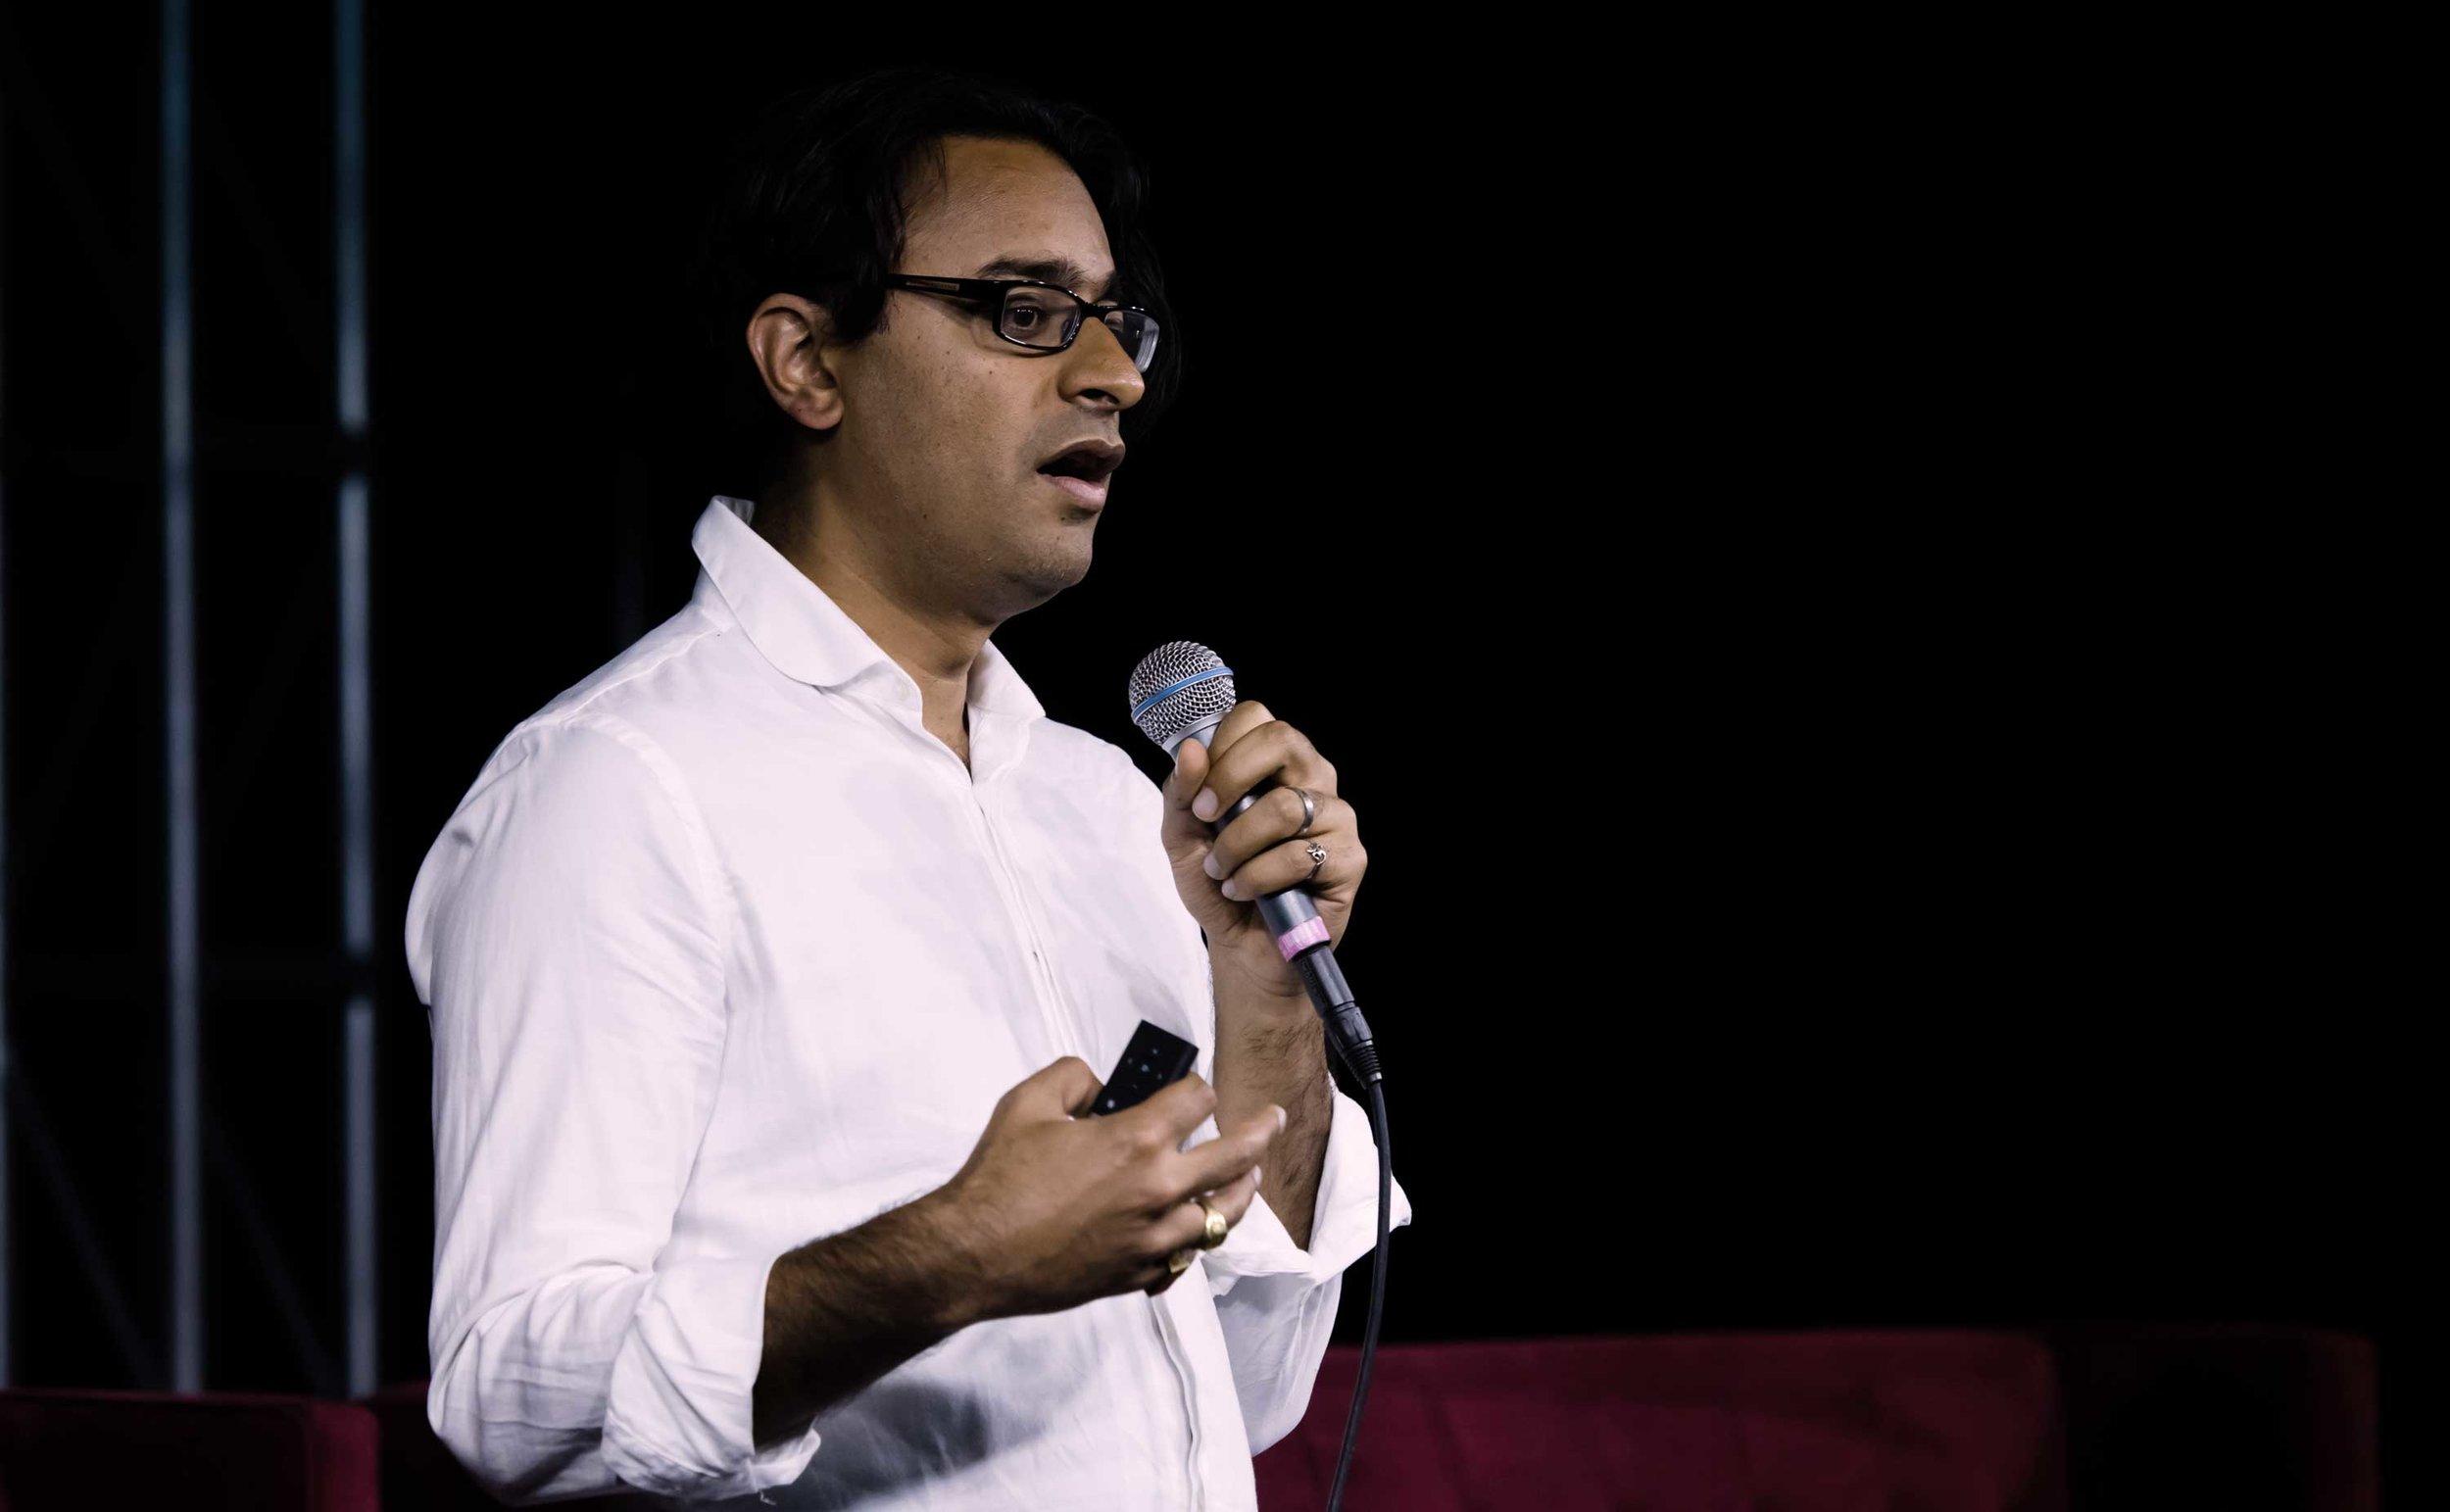 Ajay-Kapur_Photo-Victor-Bittorf.jpg